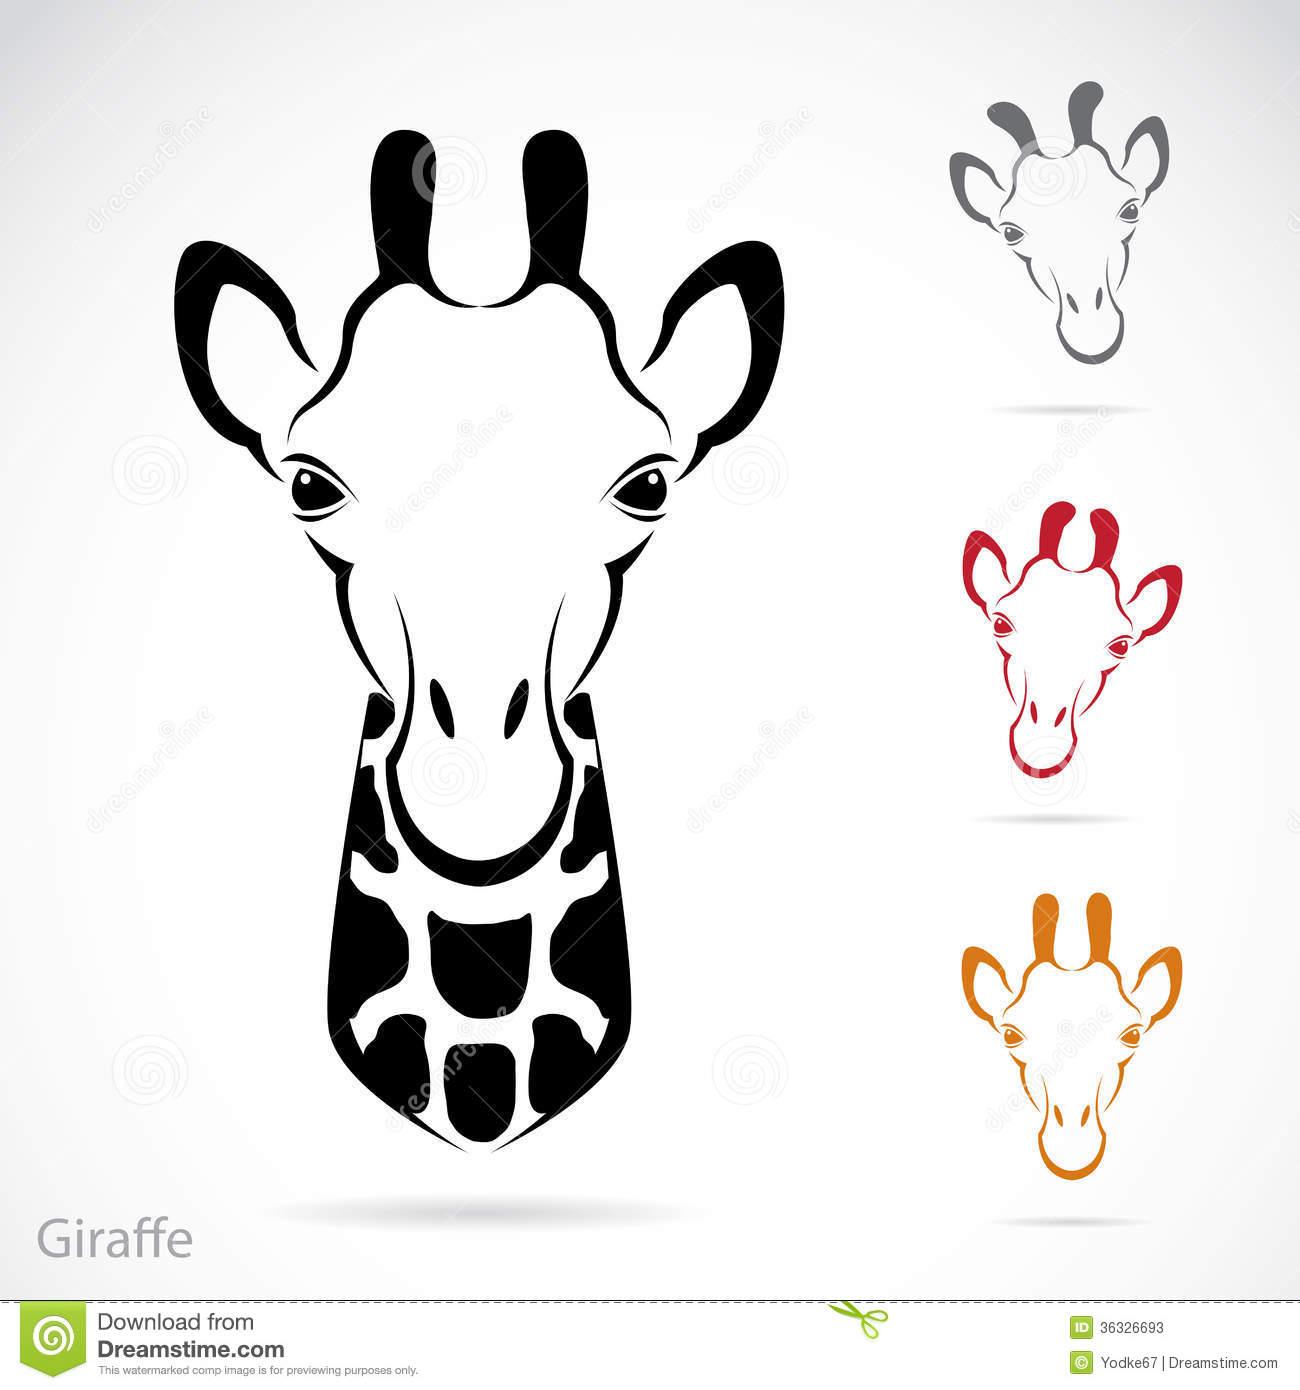 giraffe%20clip%20art%20black%20and%20white